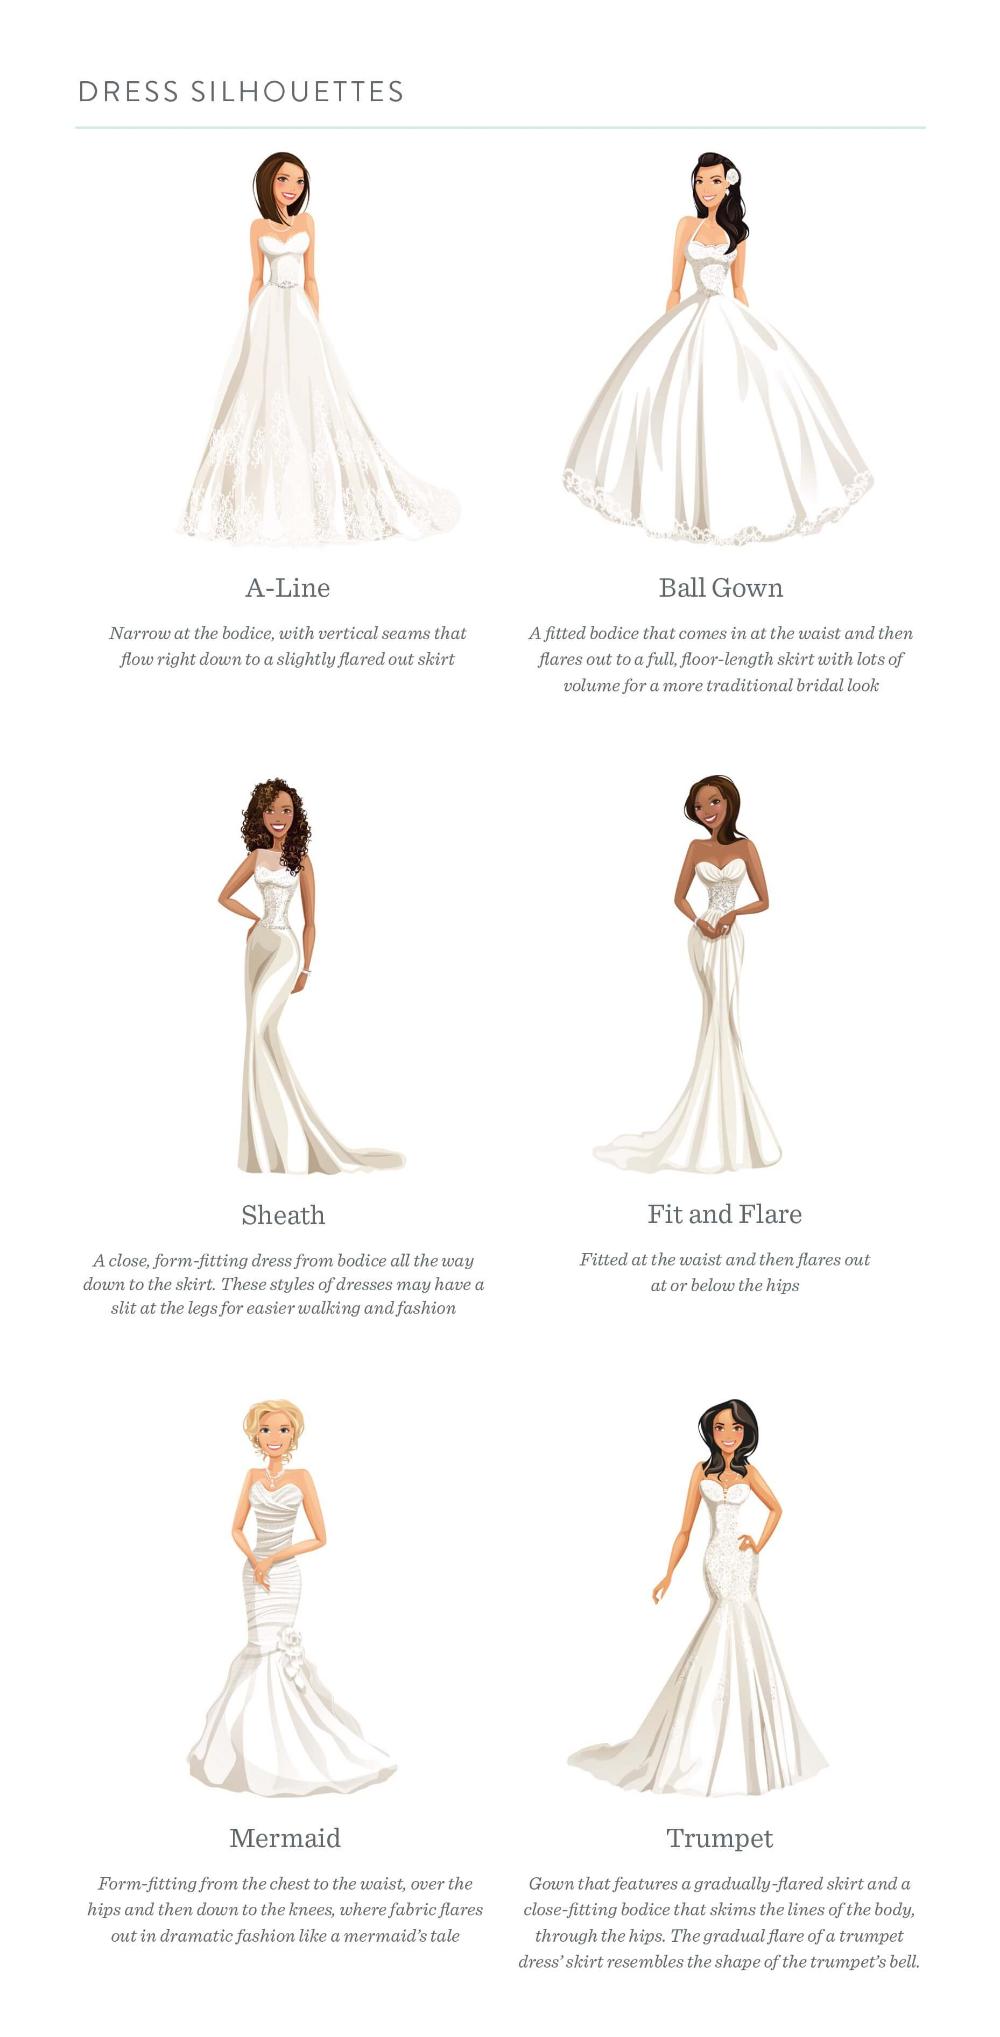 Fit N Flare Vs Mermaid Google Search Wedding Dress Styles Chart Wedding Dresses Dress Styles Chart,Wedding Flower Girl Dresses Light Blue